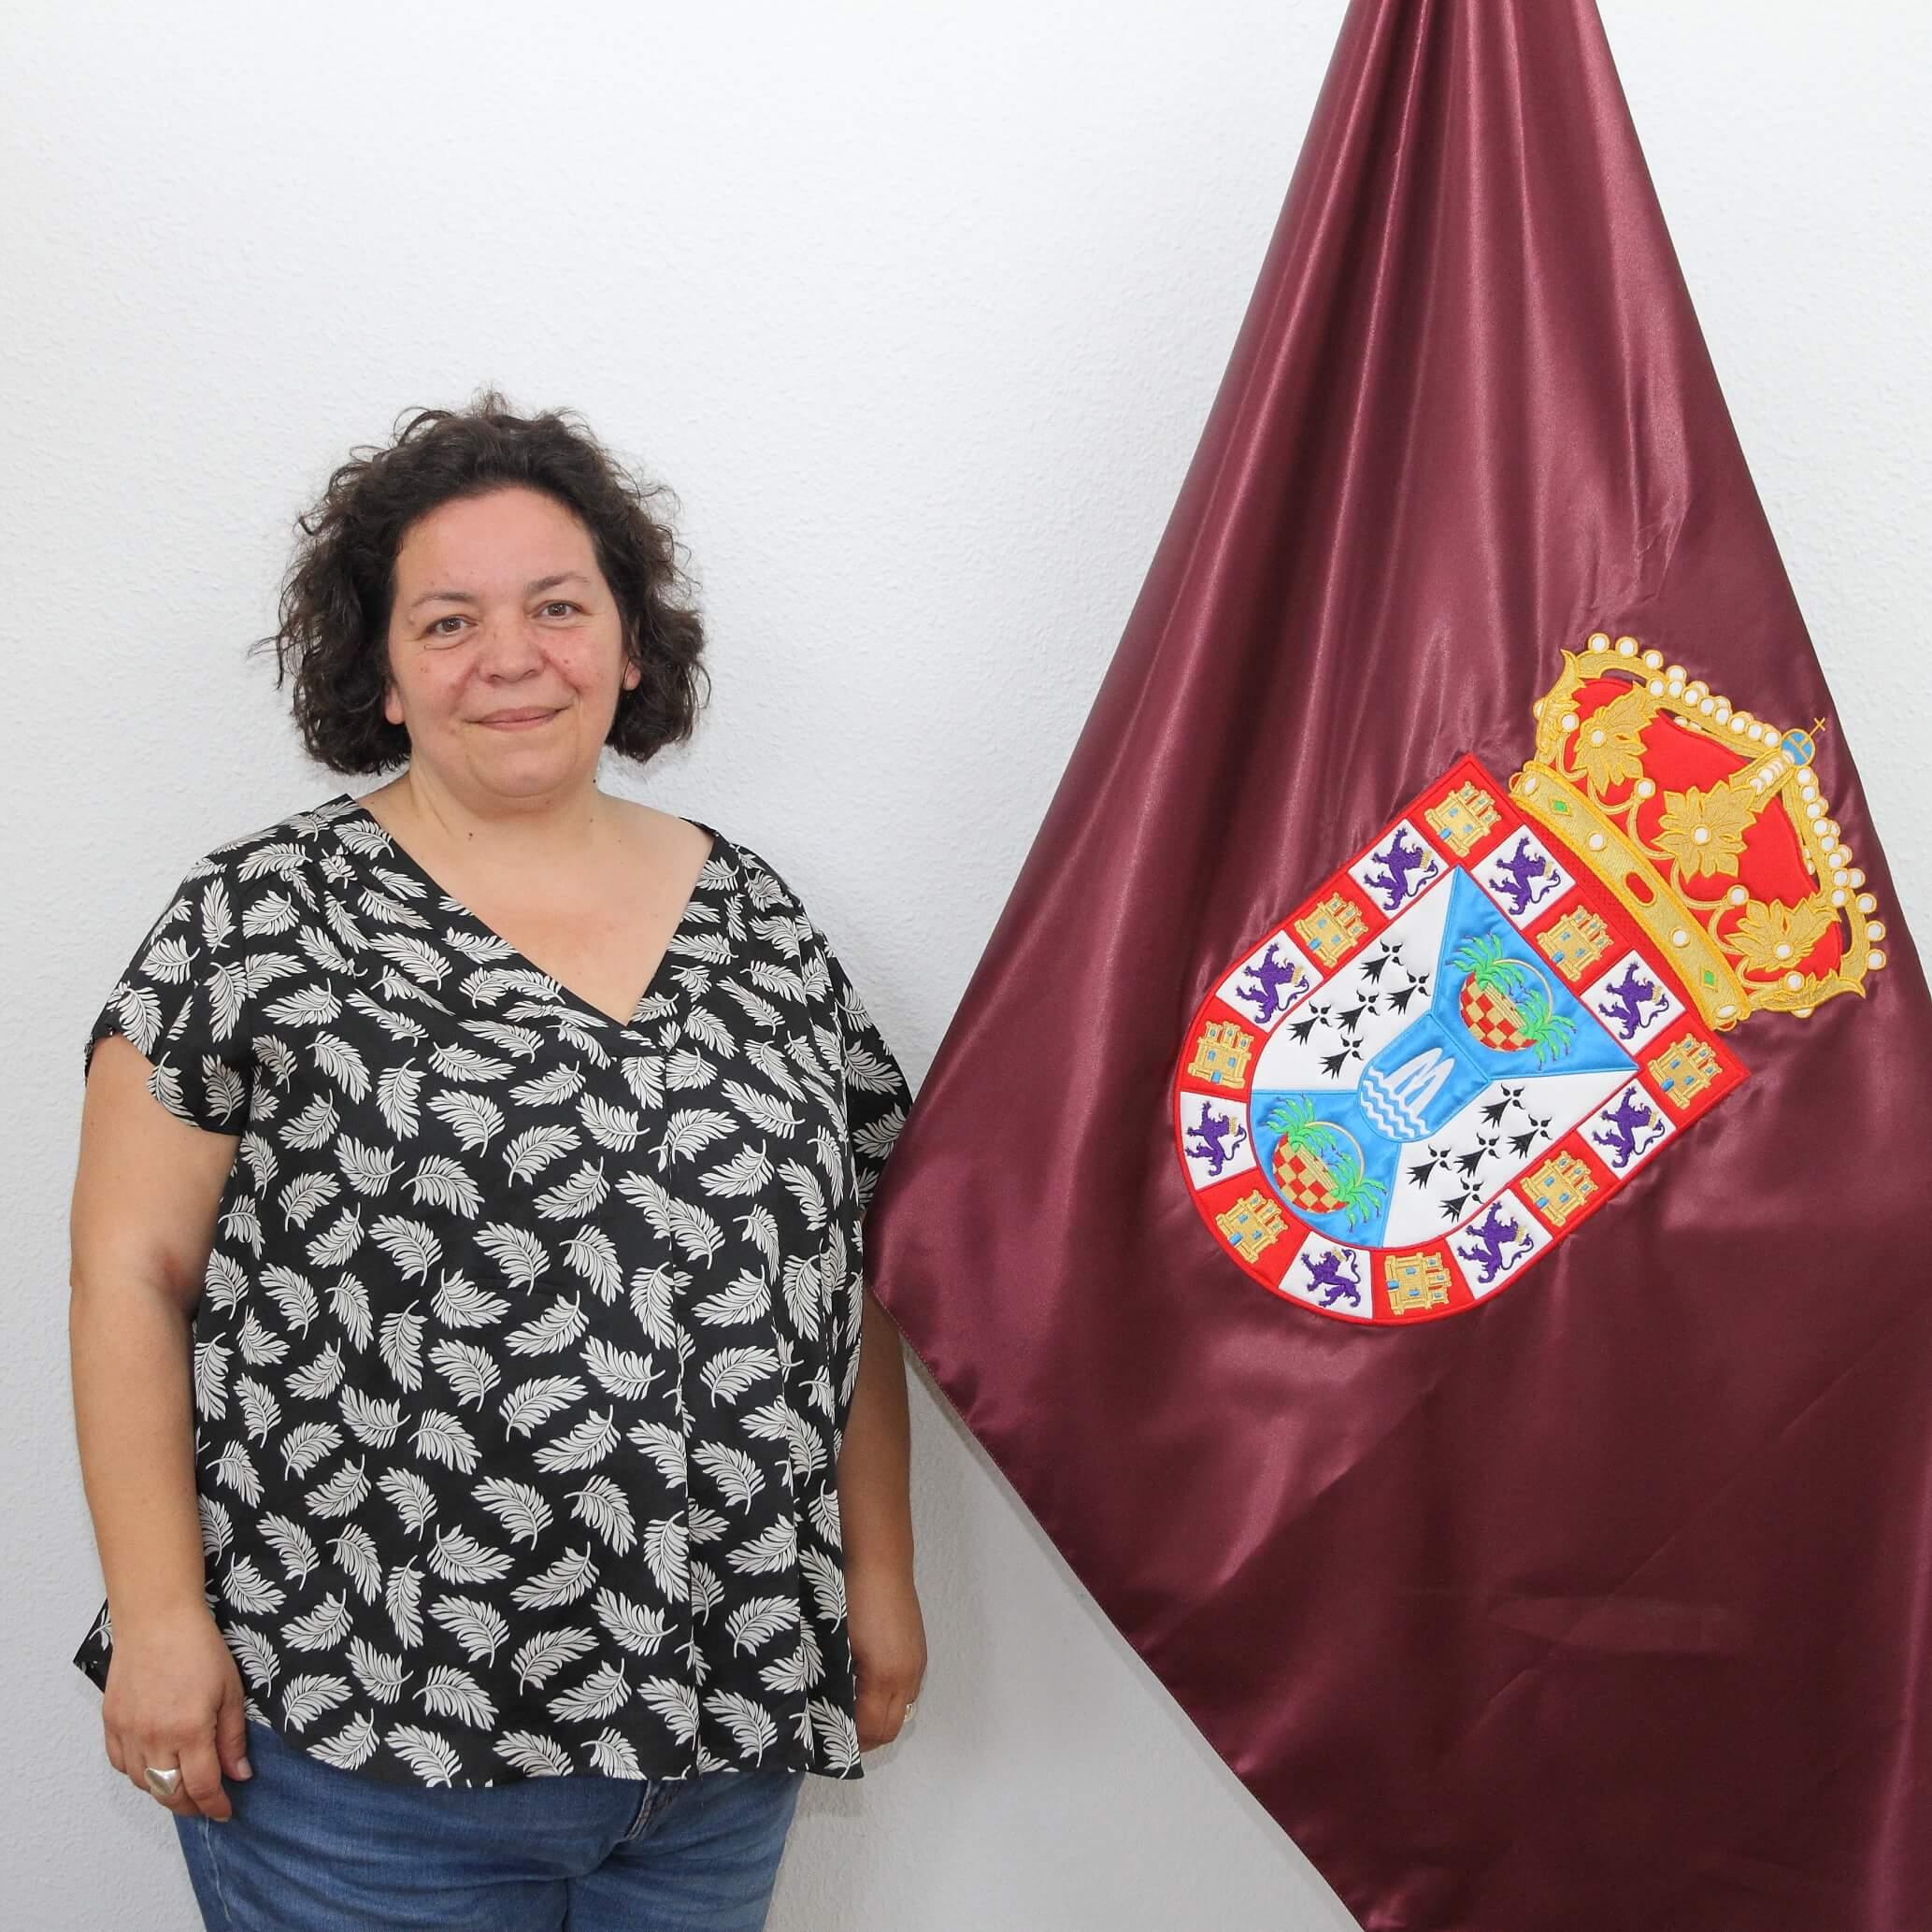 EMILIA DE LA TORRE